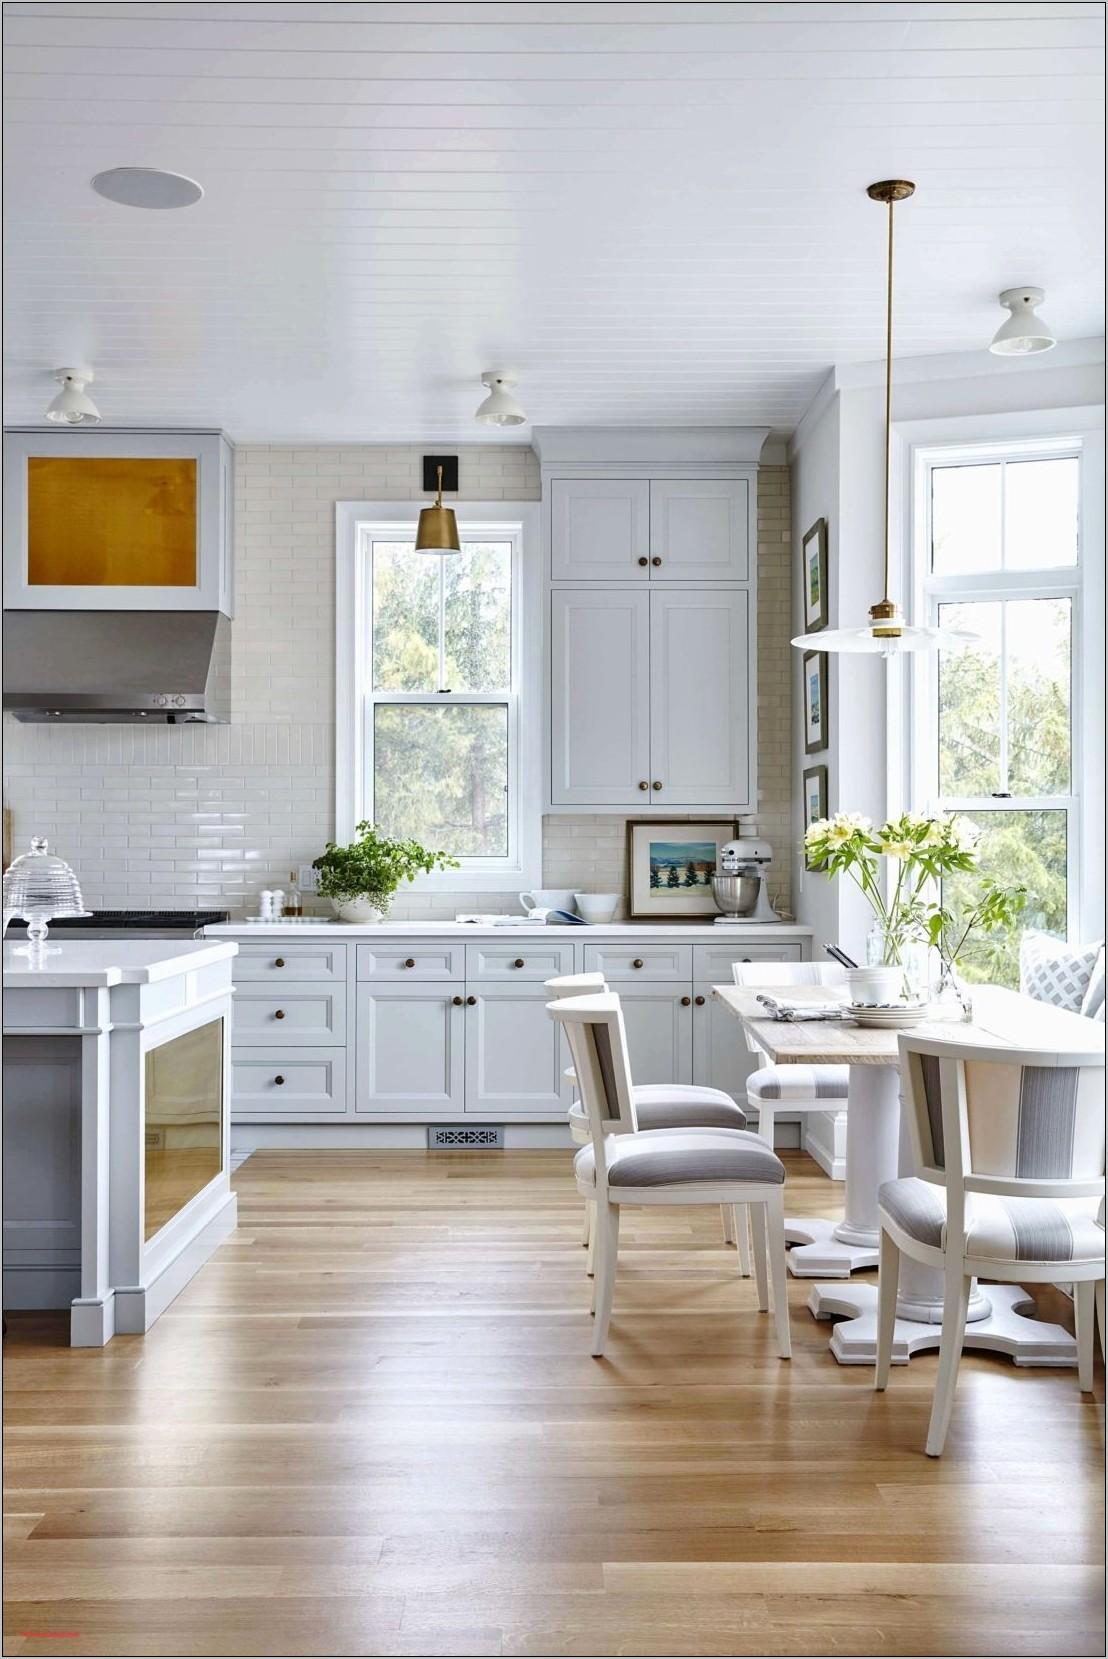 Pinterest Simple Kitchen Decor